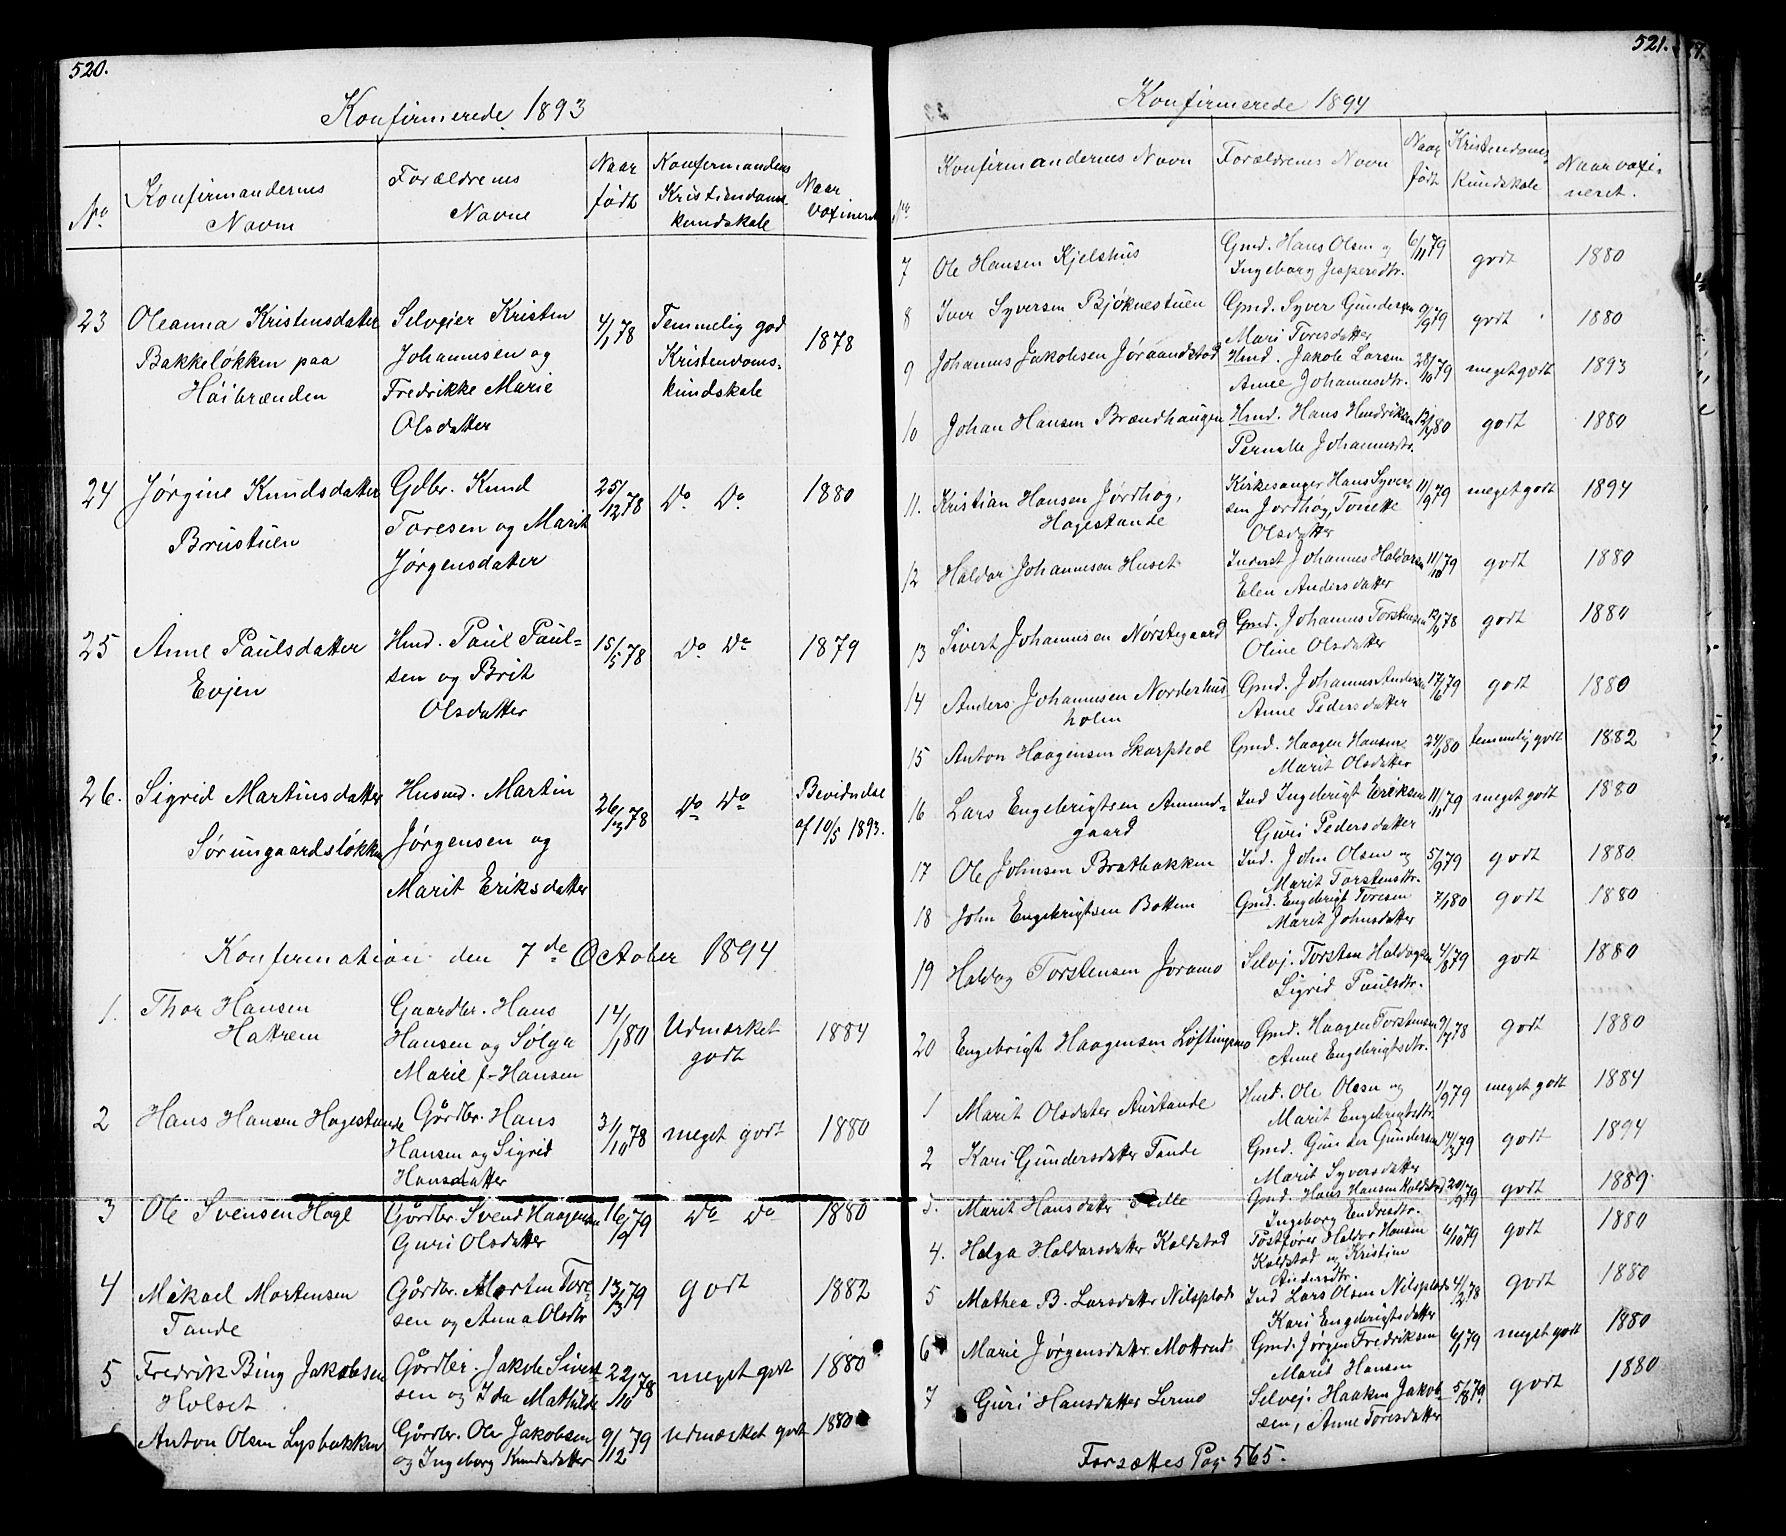 SAH, Lesja prestekontor, Klokkerbok nr. 5, 1850-1894, s. 520-521